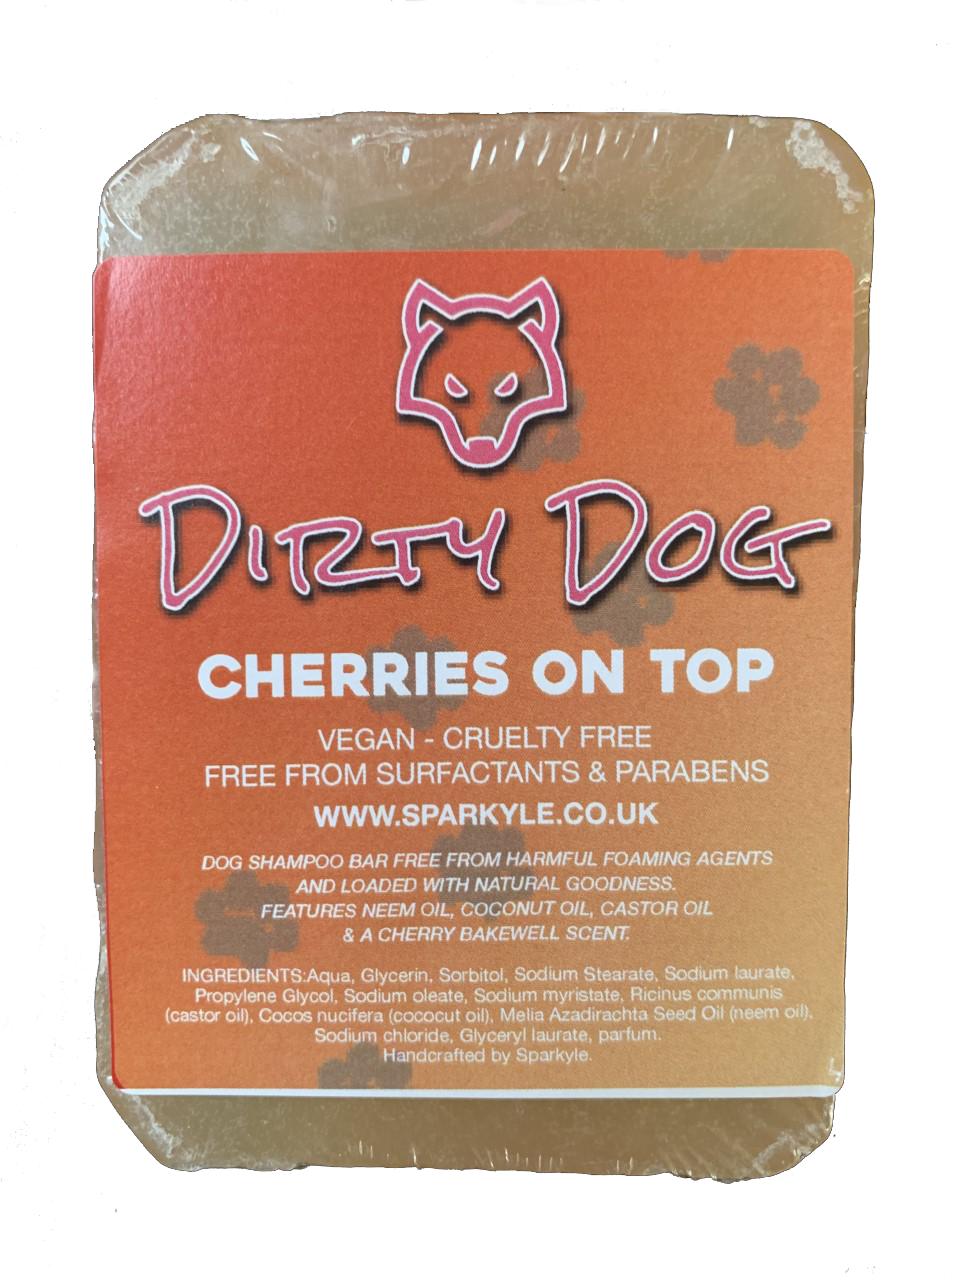 Dirty Dog Cherries on Top Shampoo Bar